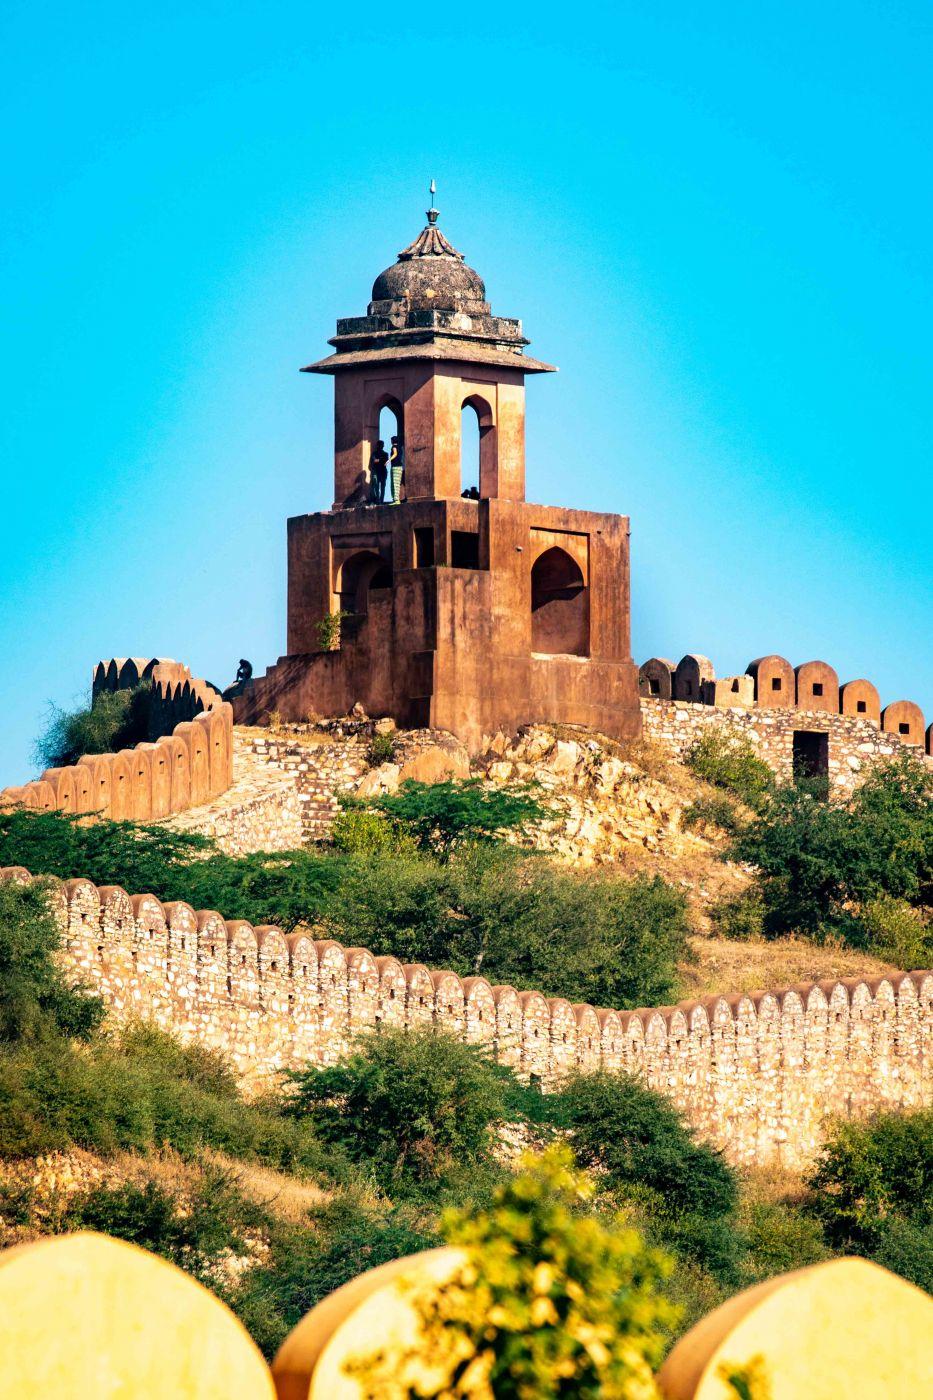 Amber fort tower Jaipur, India